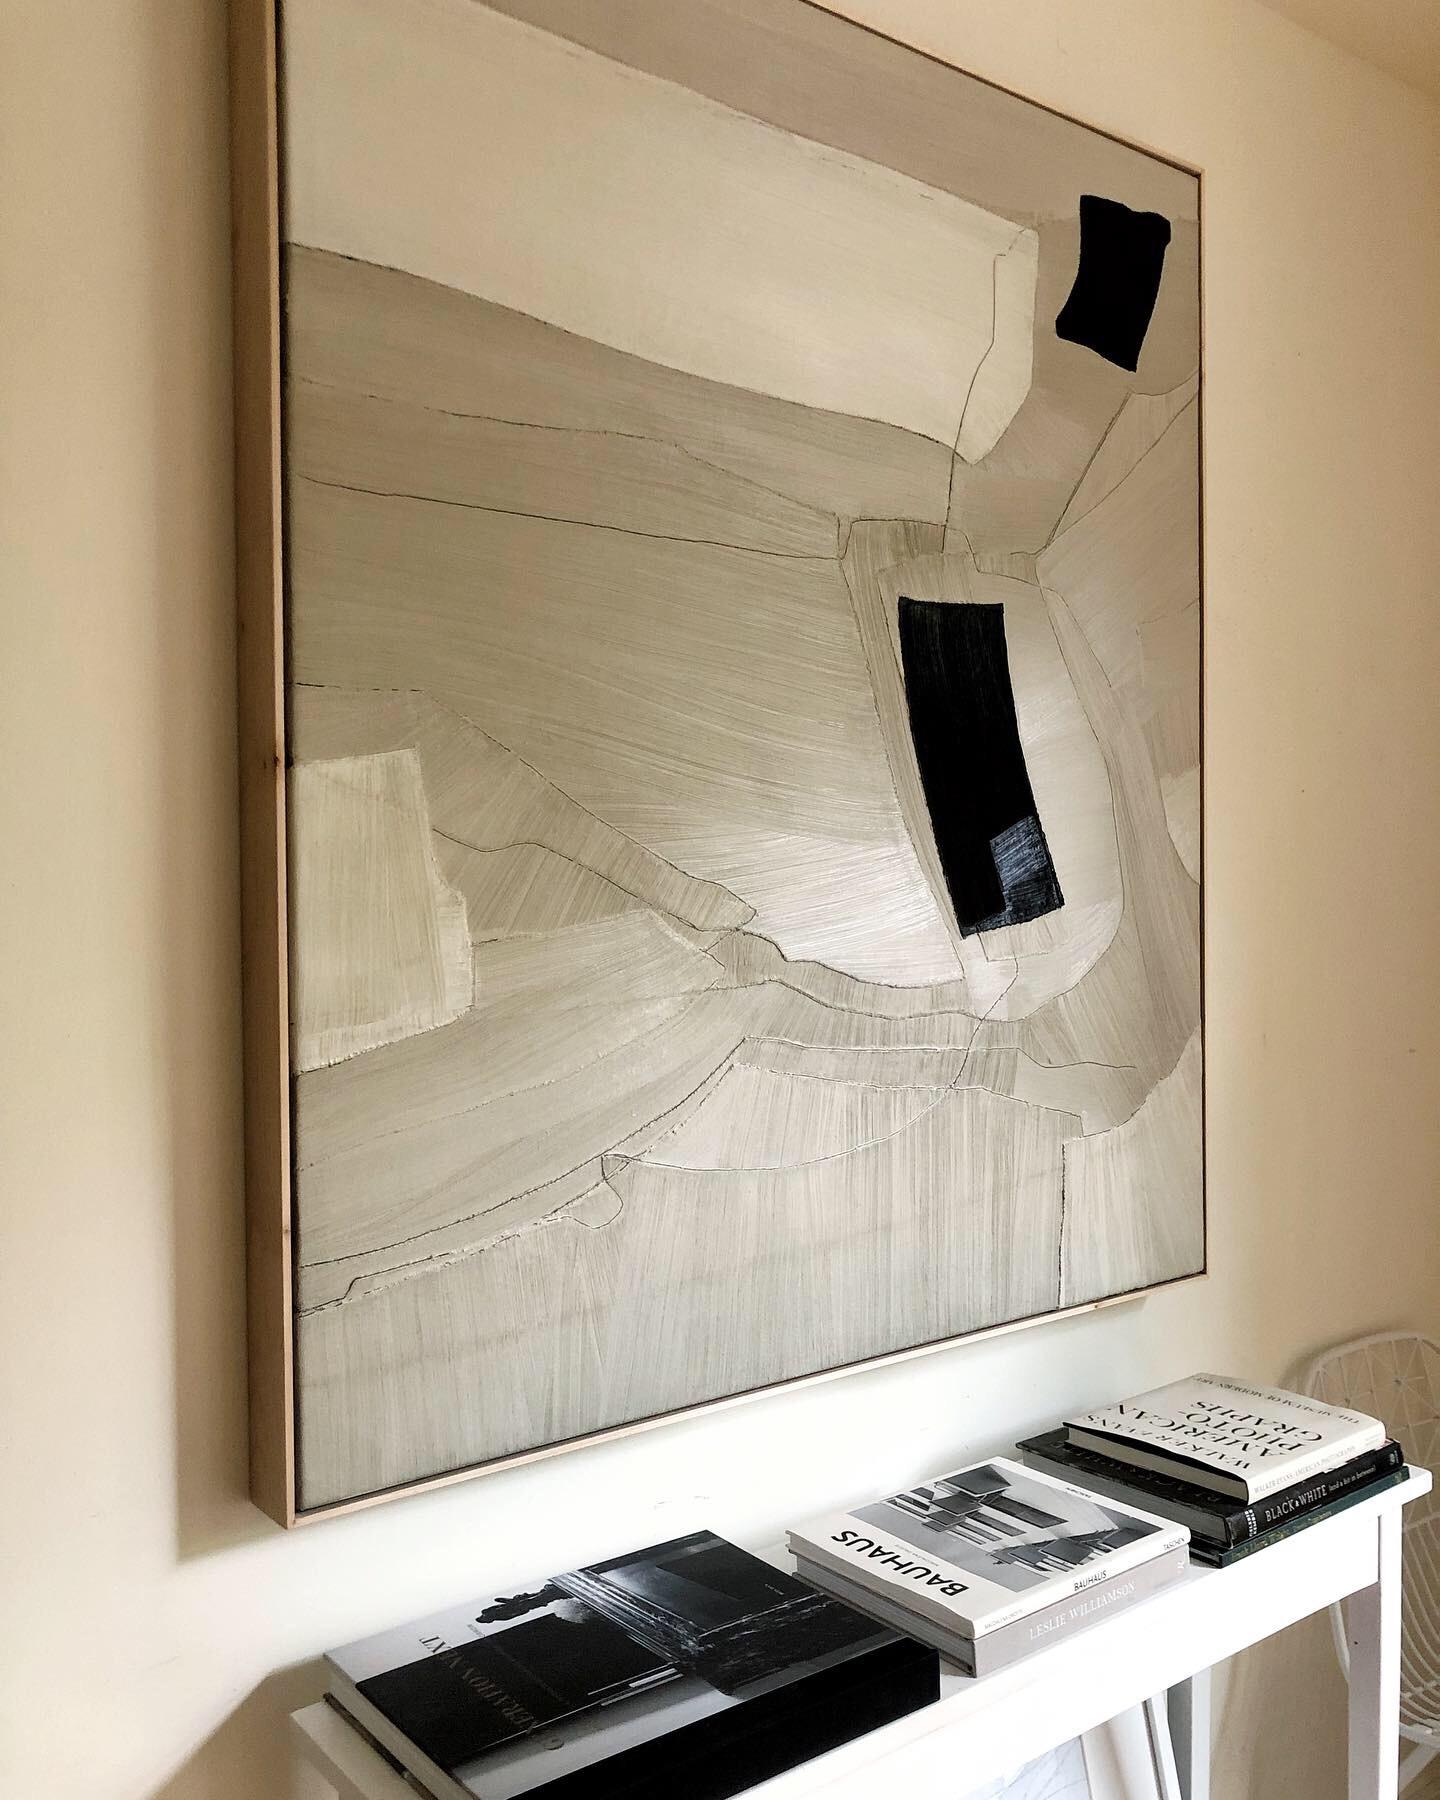 Corinne abstract.JPG